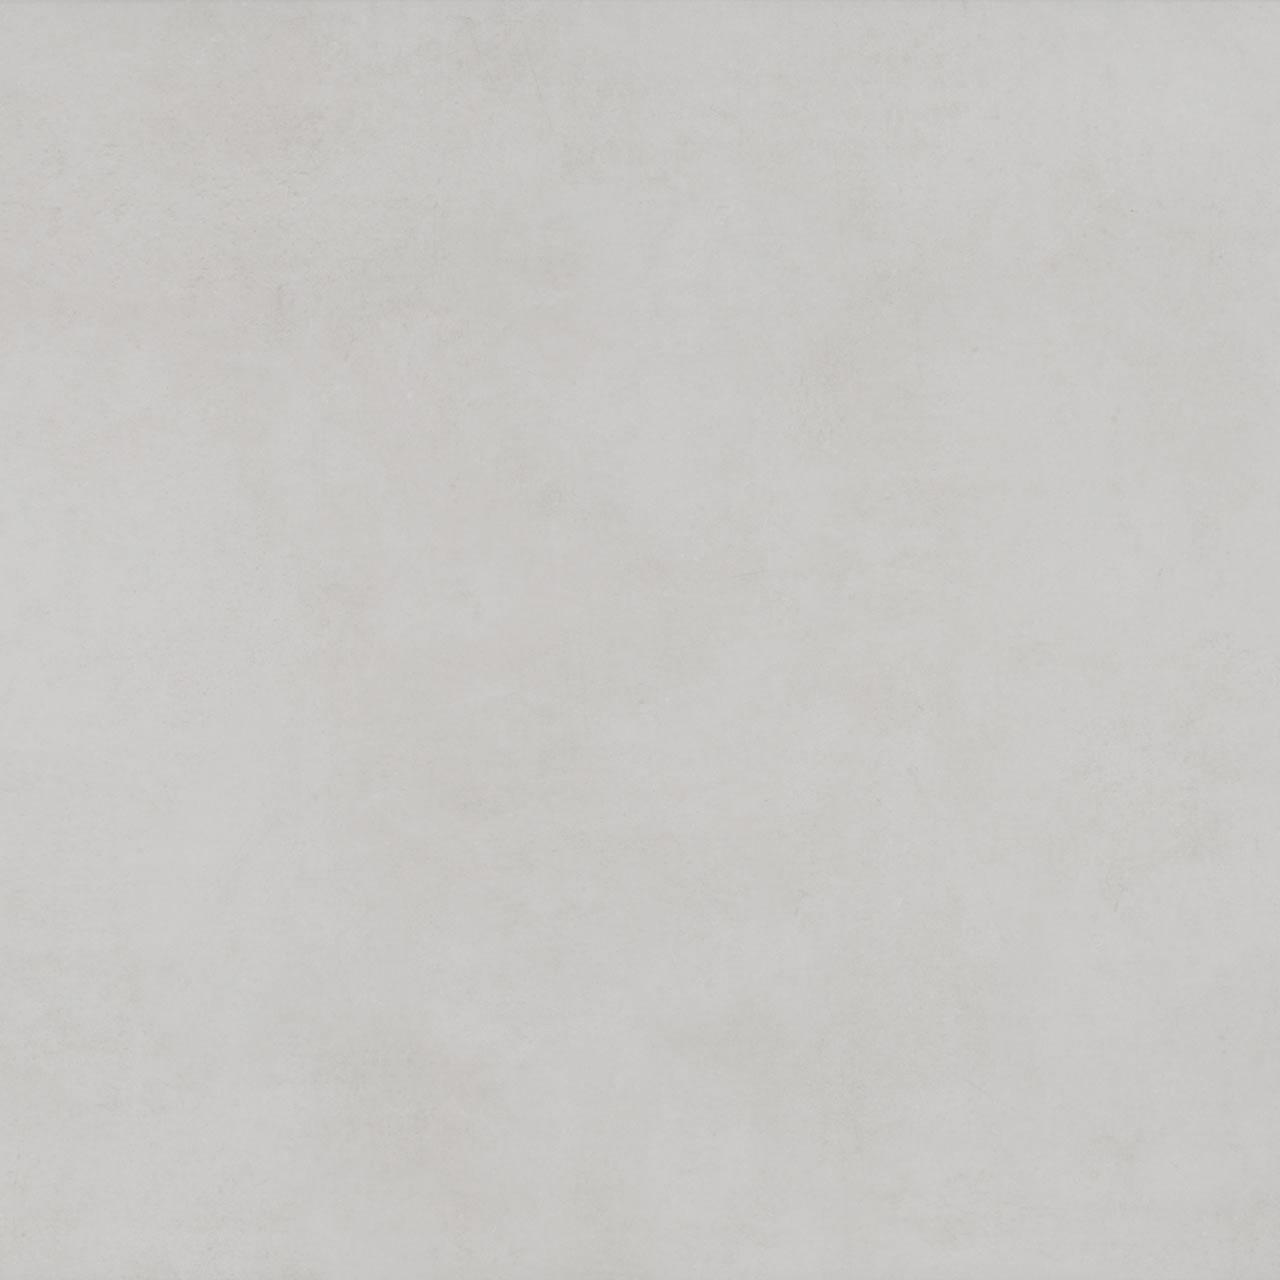 nonconductive yuna Branco ac ip 90×90